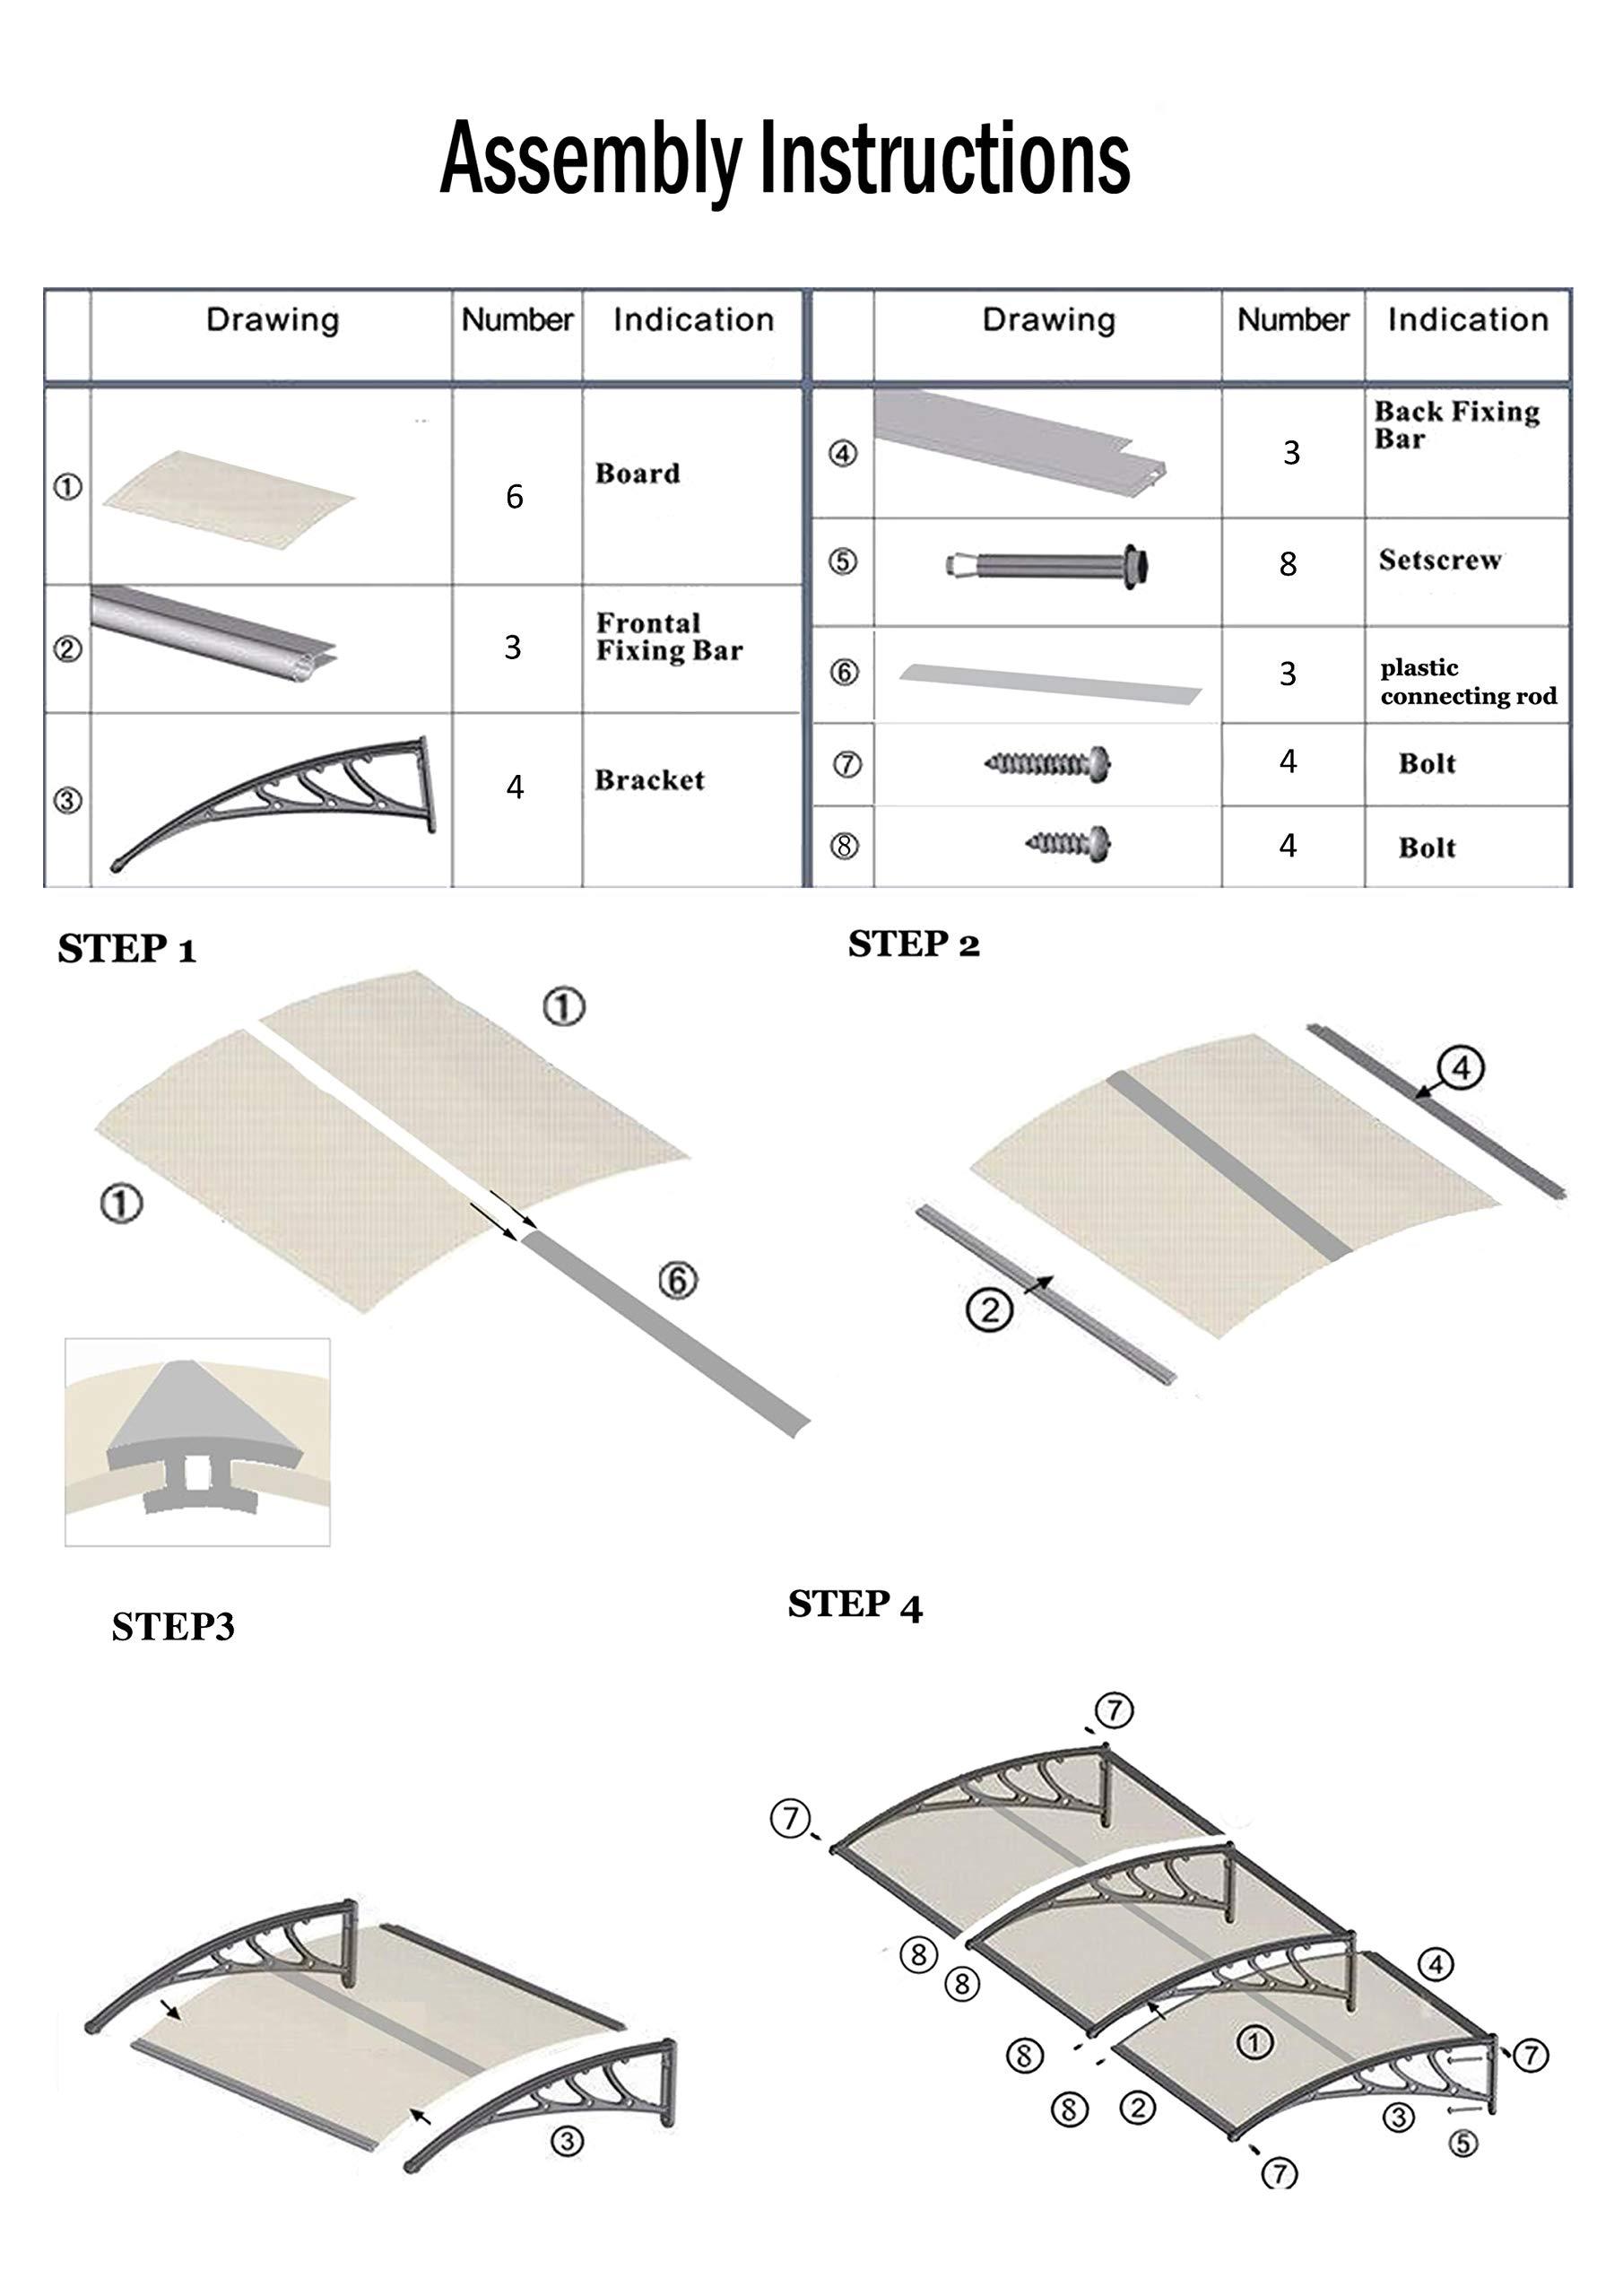 MCombo 39''×116''/39''x 78'' Window Overhead Door Awning Patio Outdoor Polycarbonate Cover Front Door Rain Sun Shetter Garden Canopy Hollow Sheet (40''x120'', Dark Brown Canopy/Black Bracket) by MCombo (Image #6)